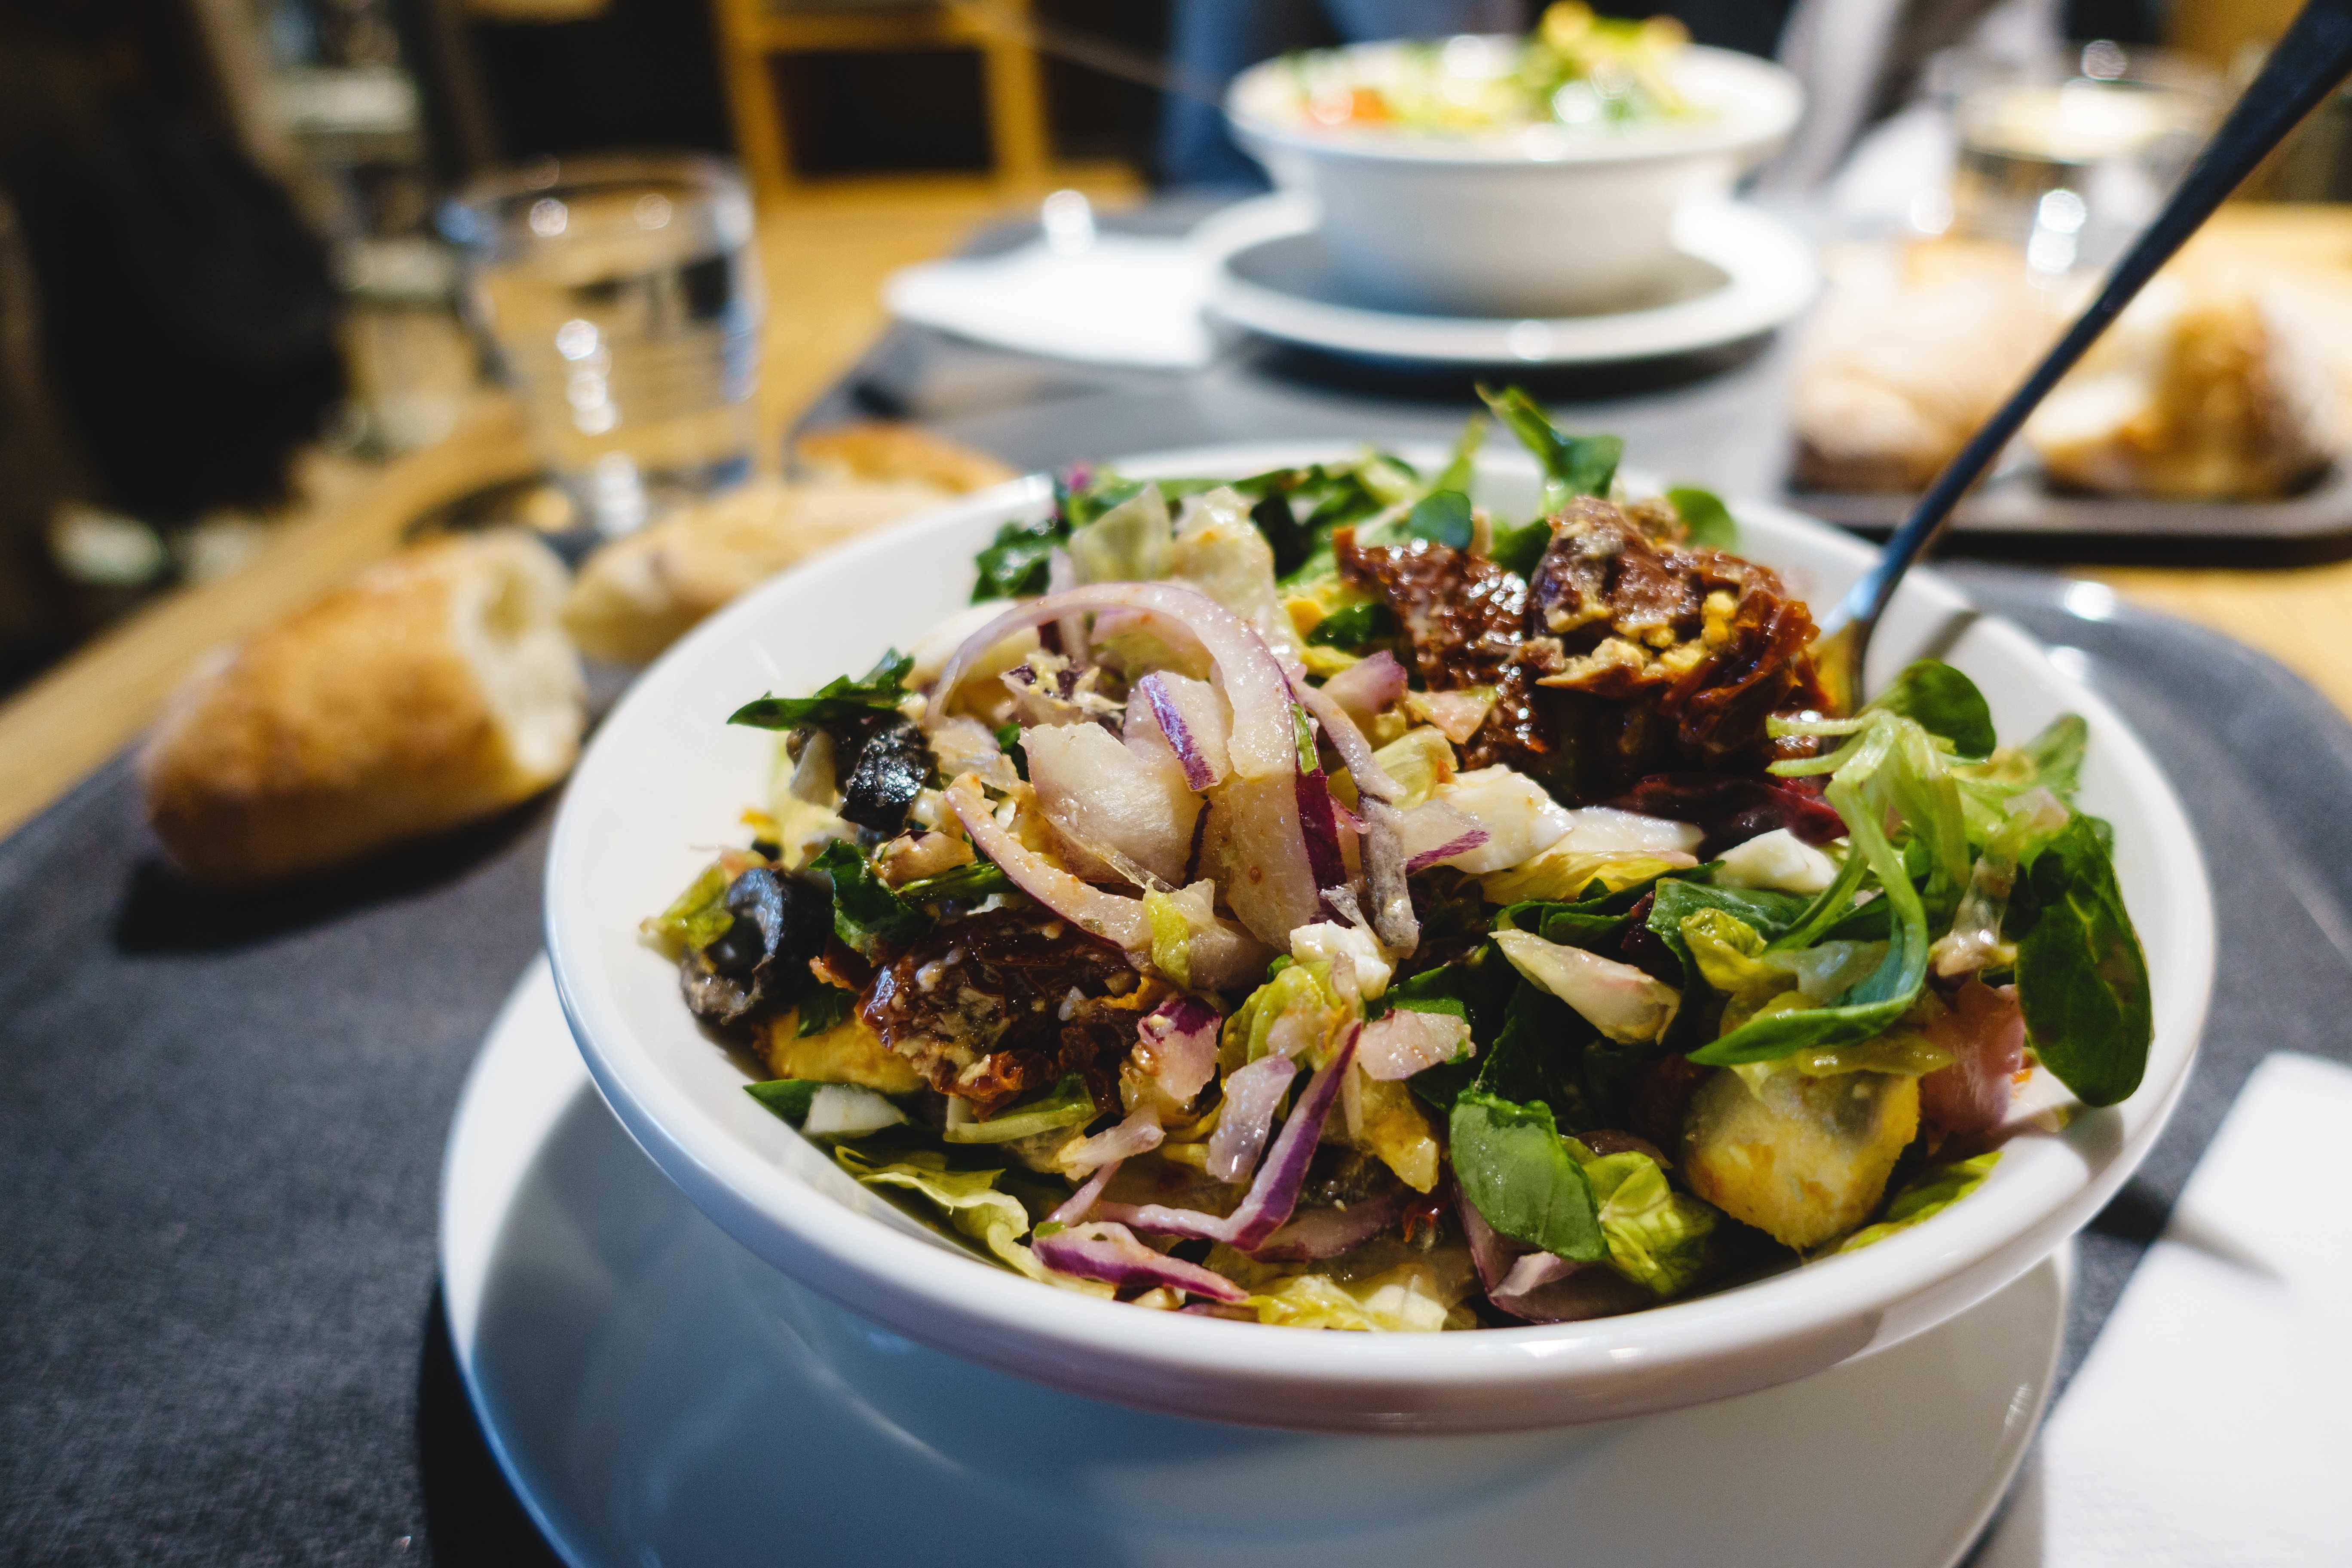 Salade de légumes et sardines fumées